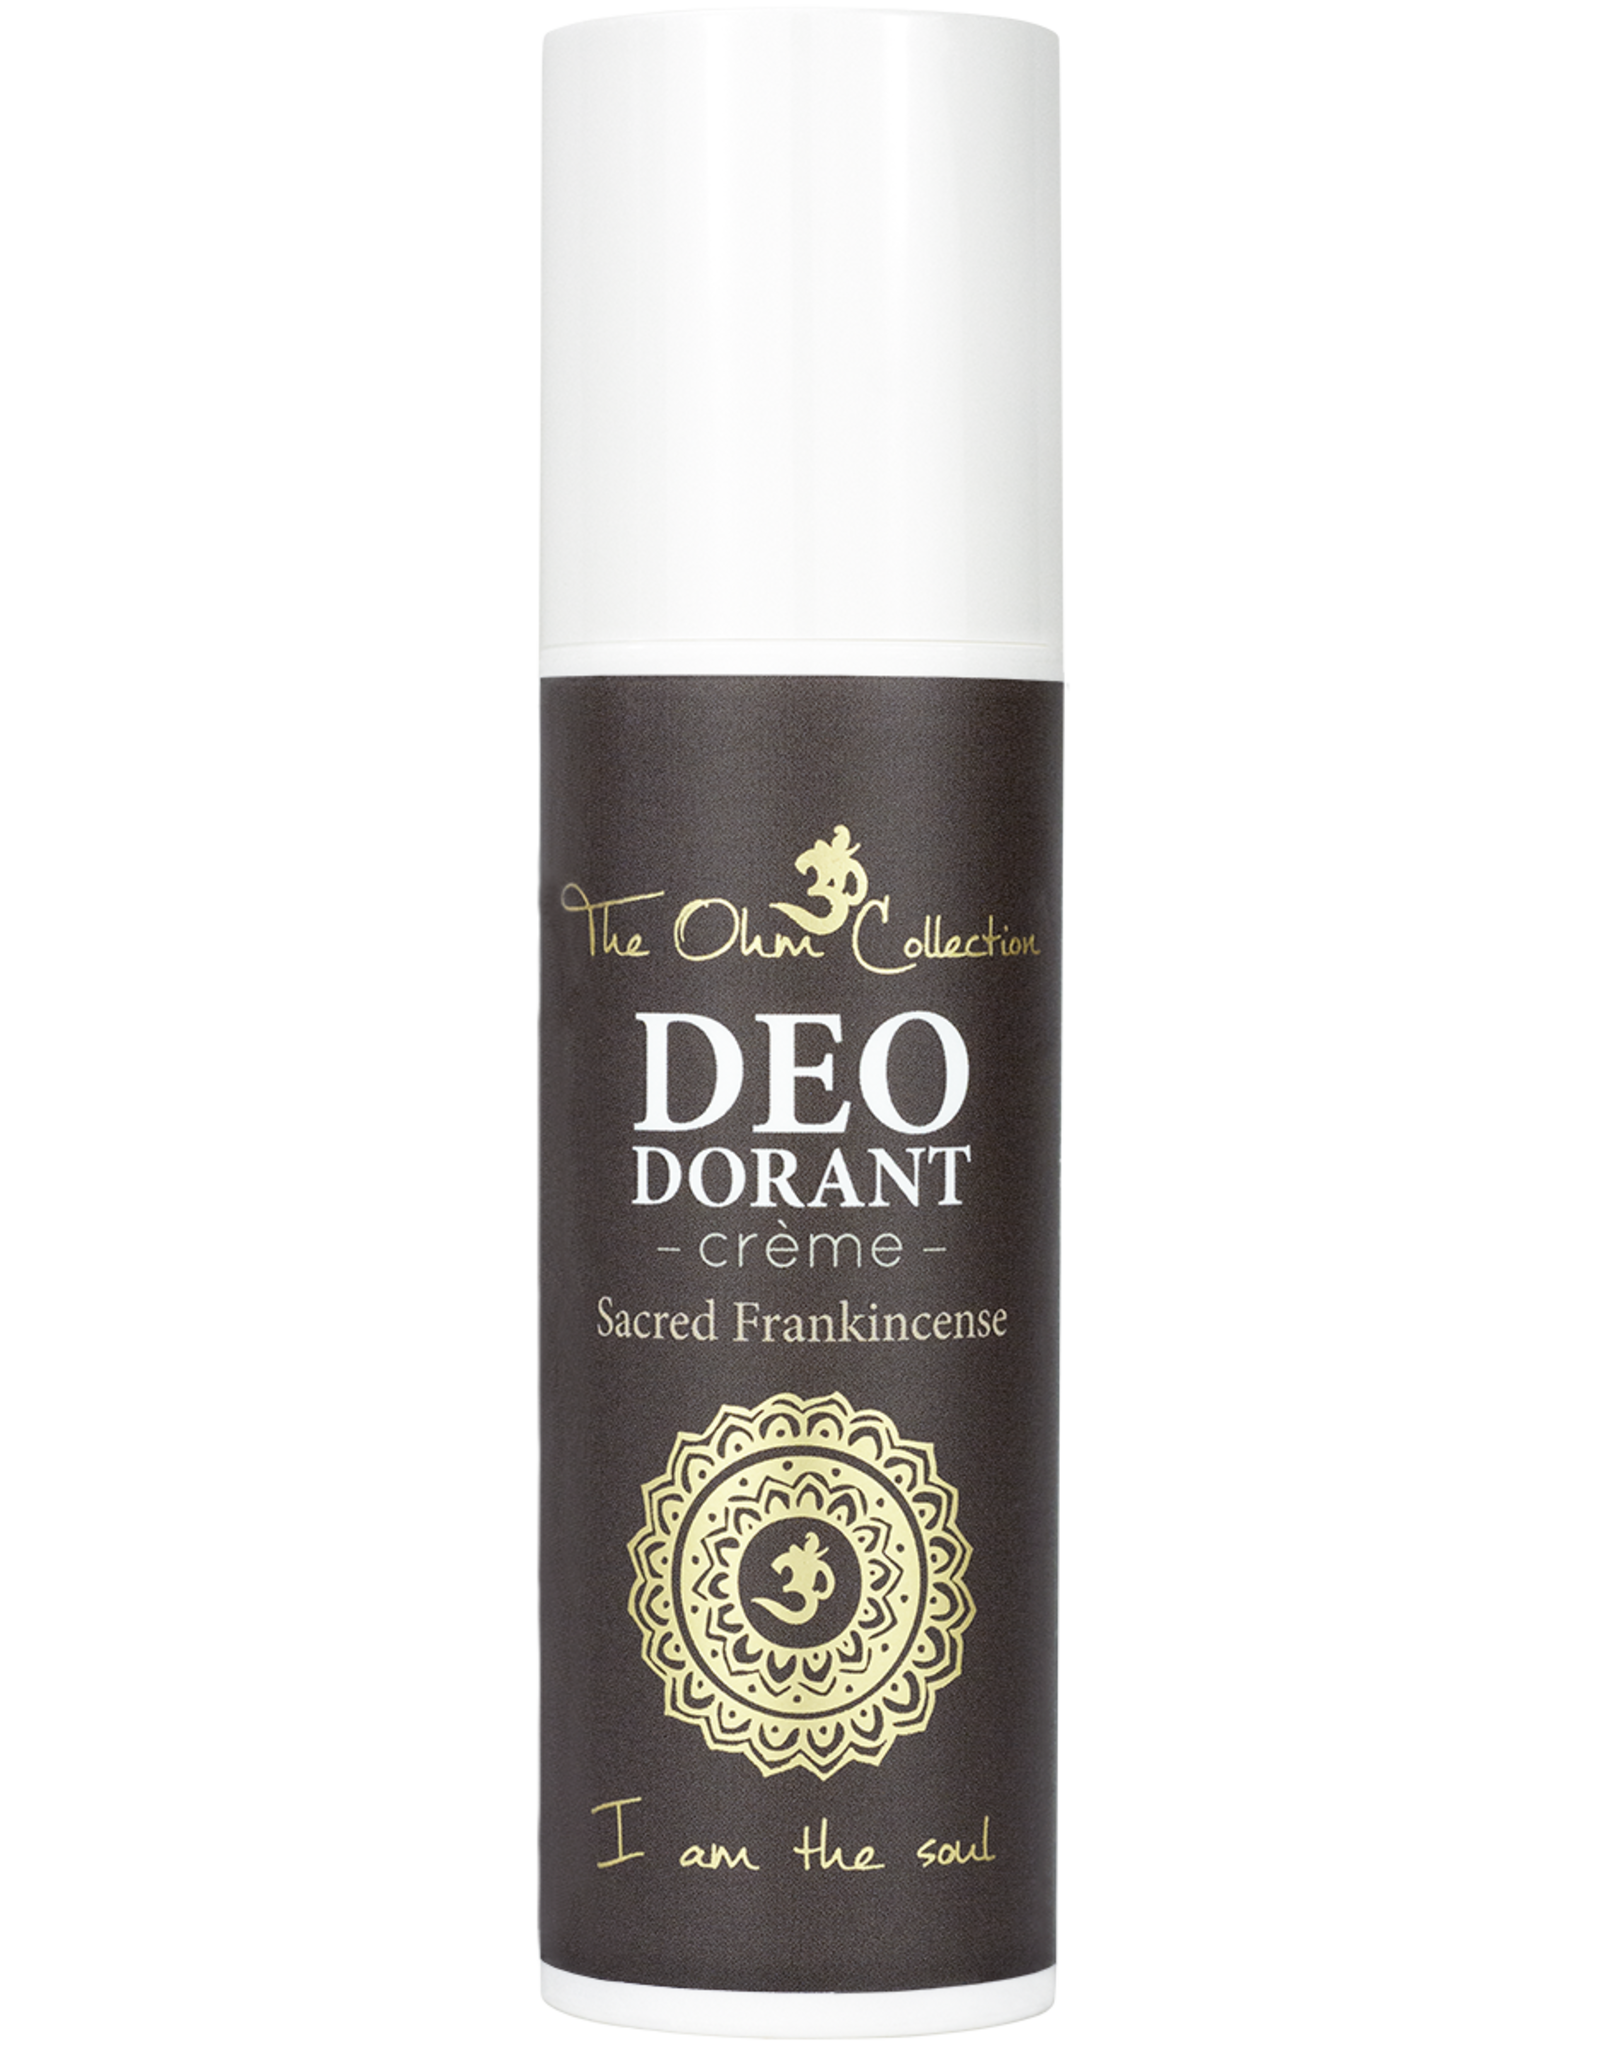 Ohm Deo Dorant Creme SacredFrankincense 50 ml